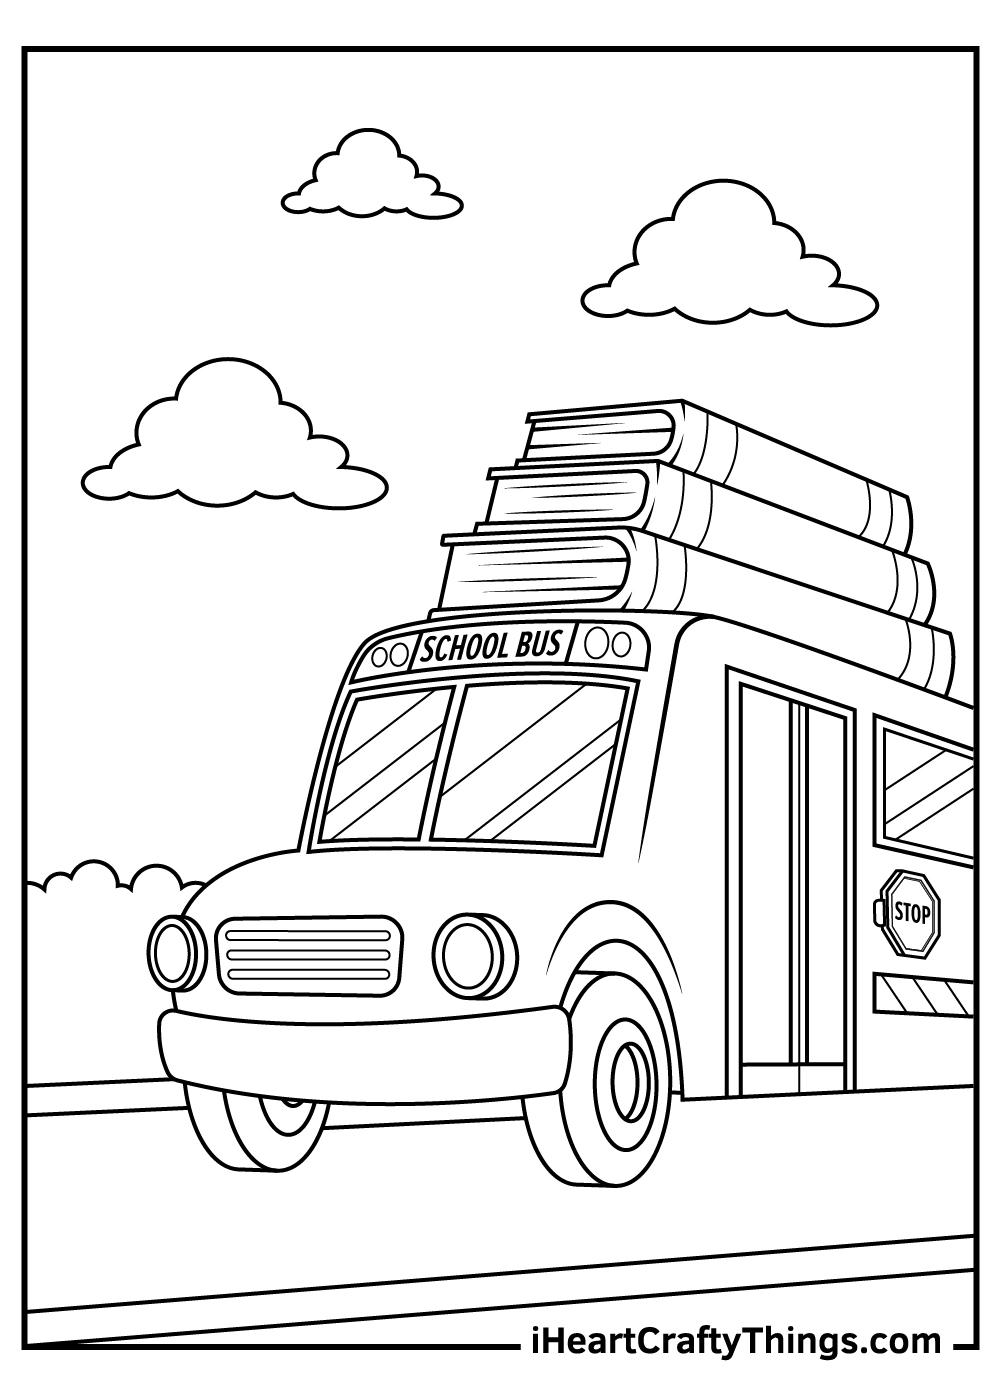 school bus coloring pages for kindergarten